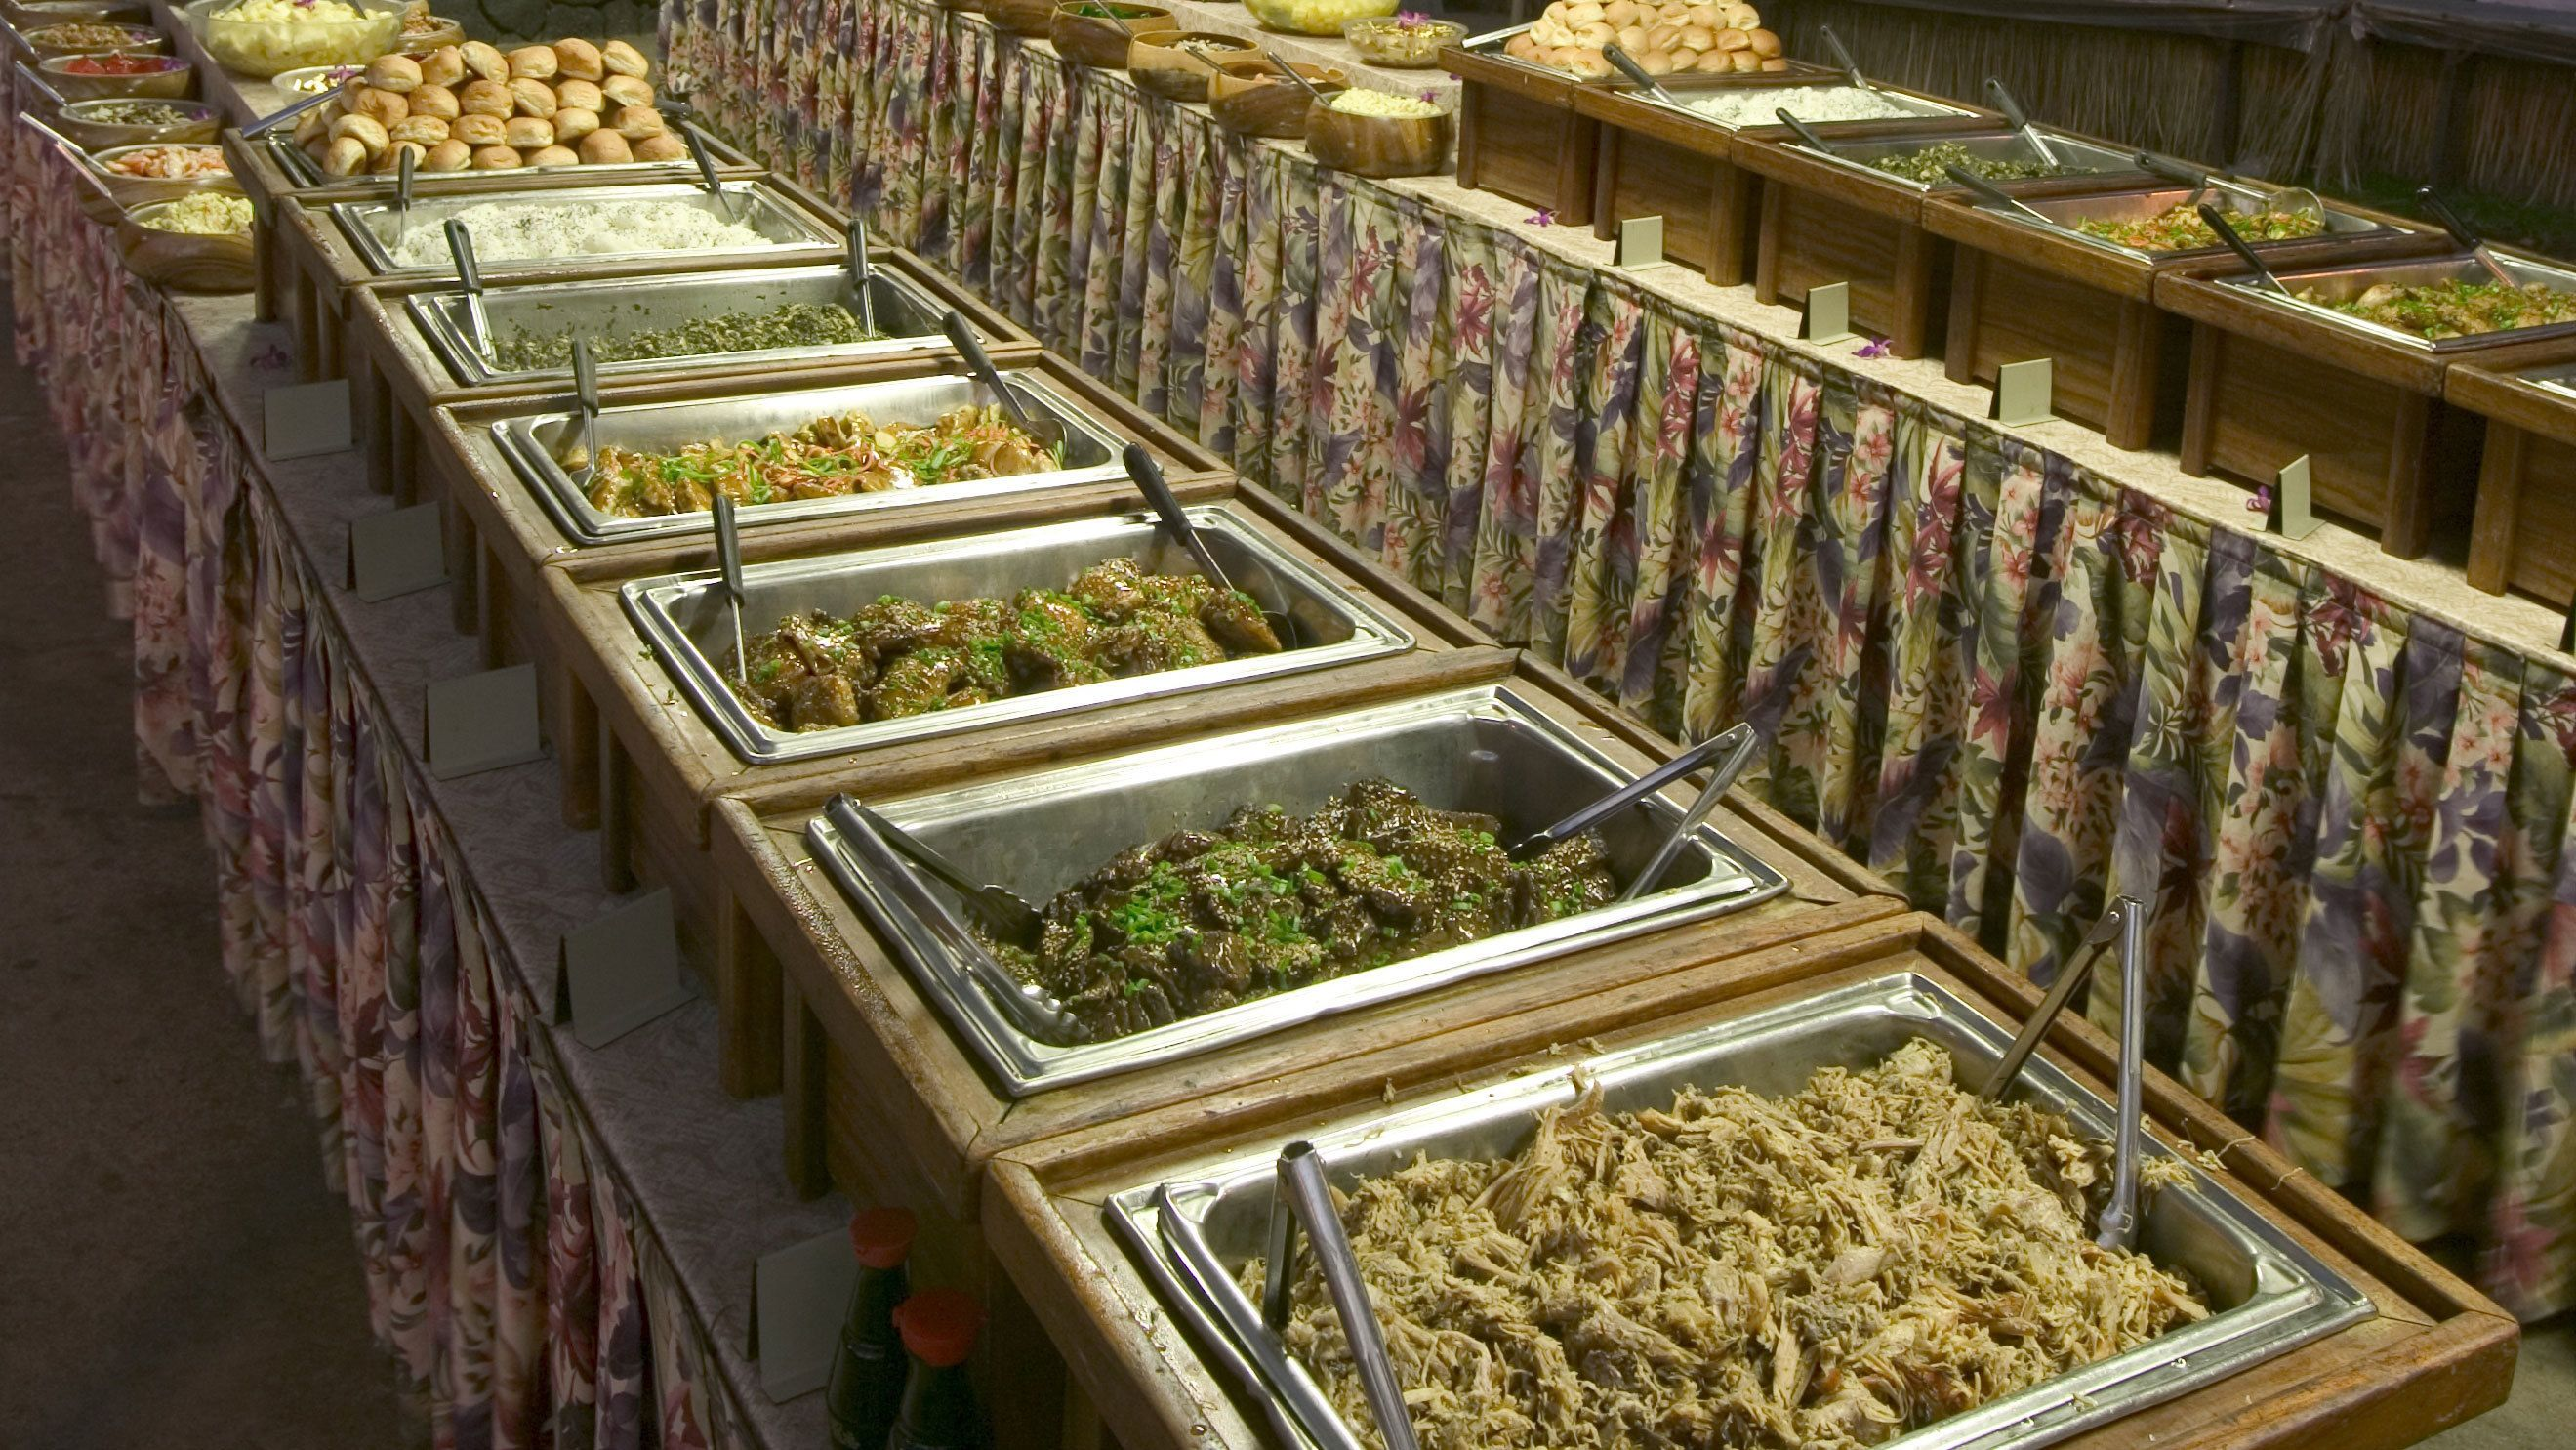 Buffet style food set up in the Royal Kona Resort in Hawaii